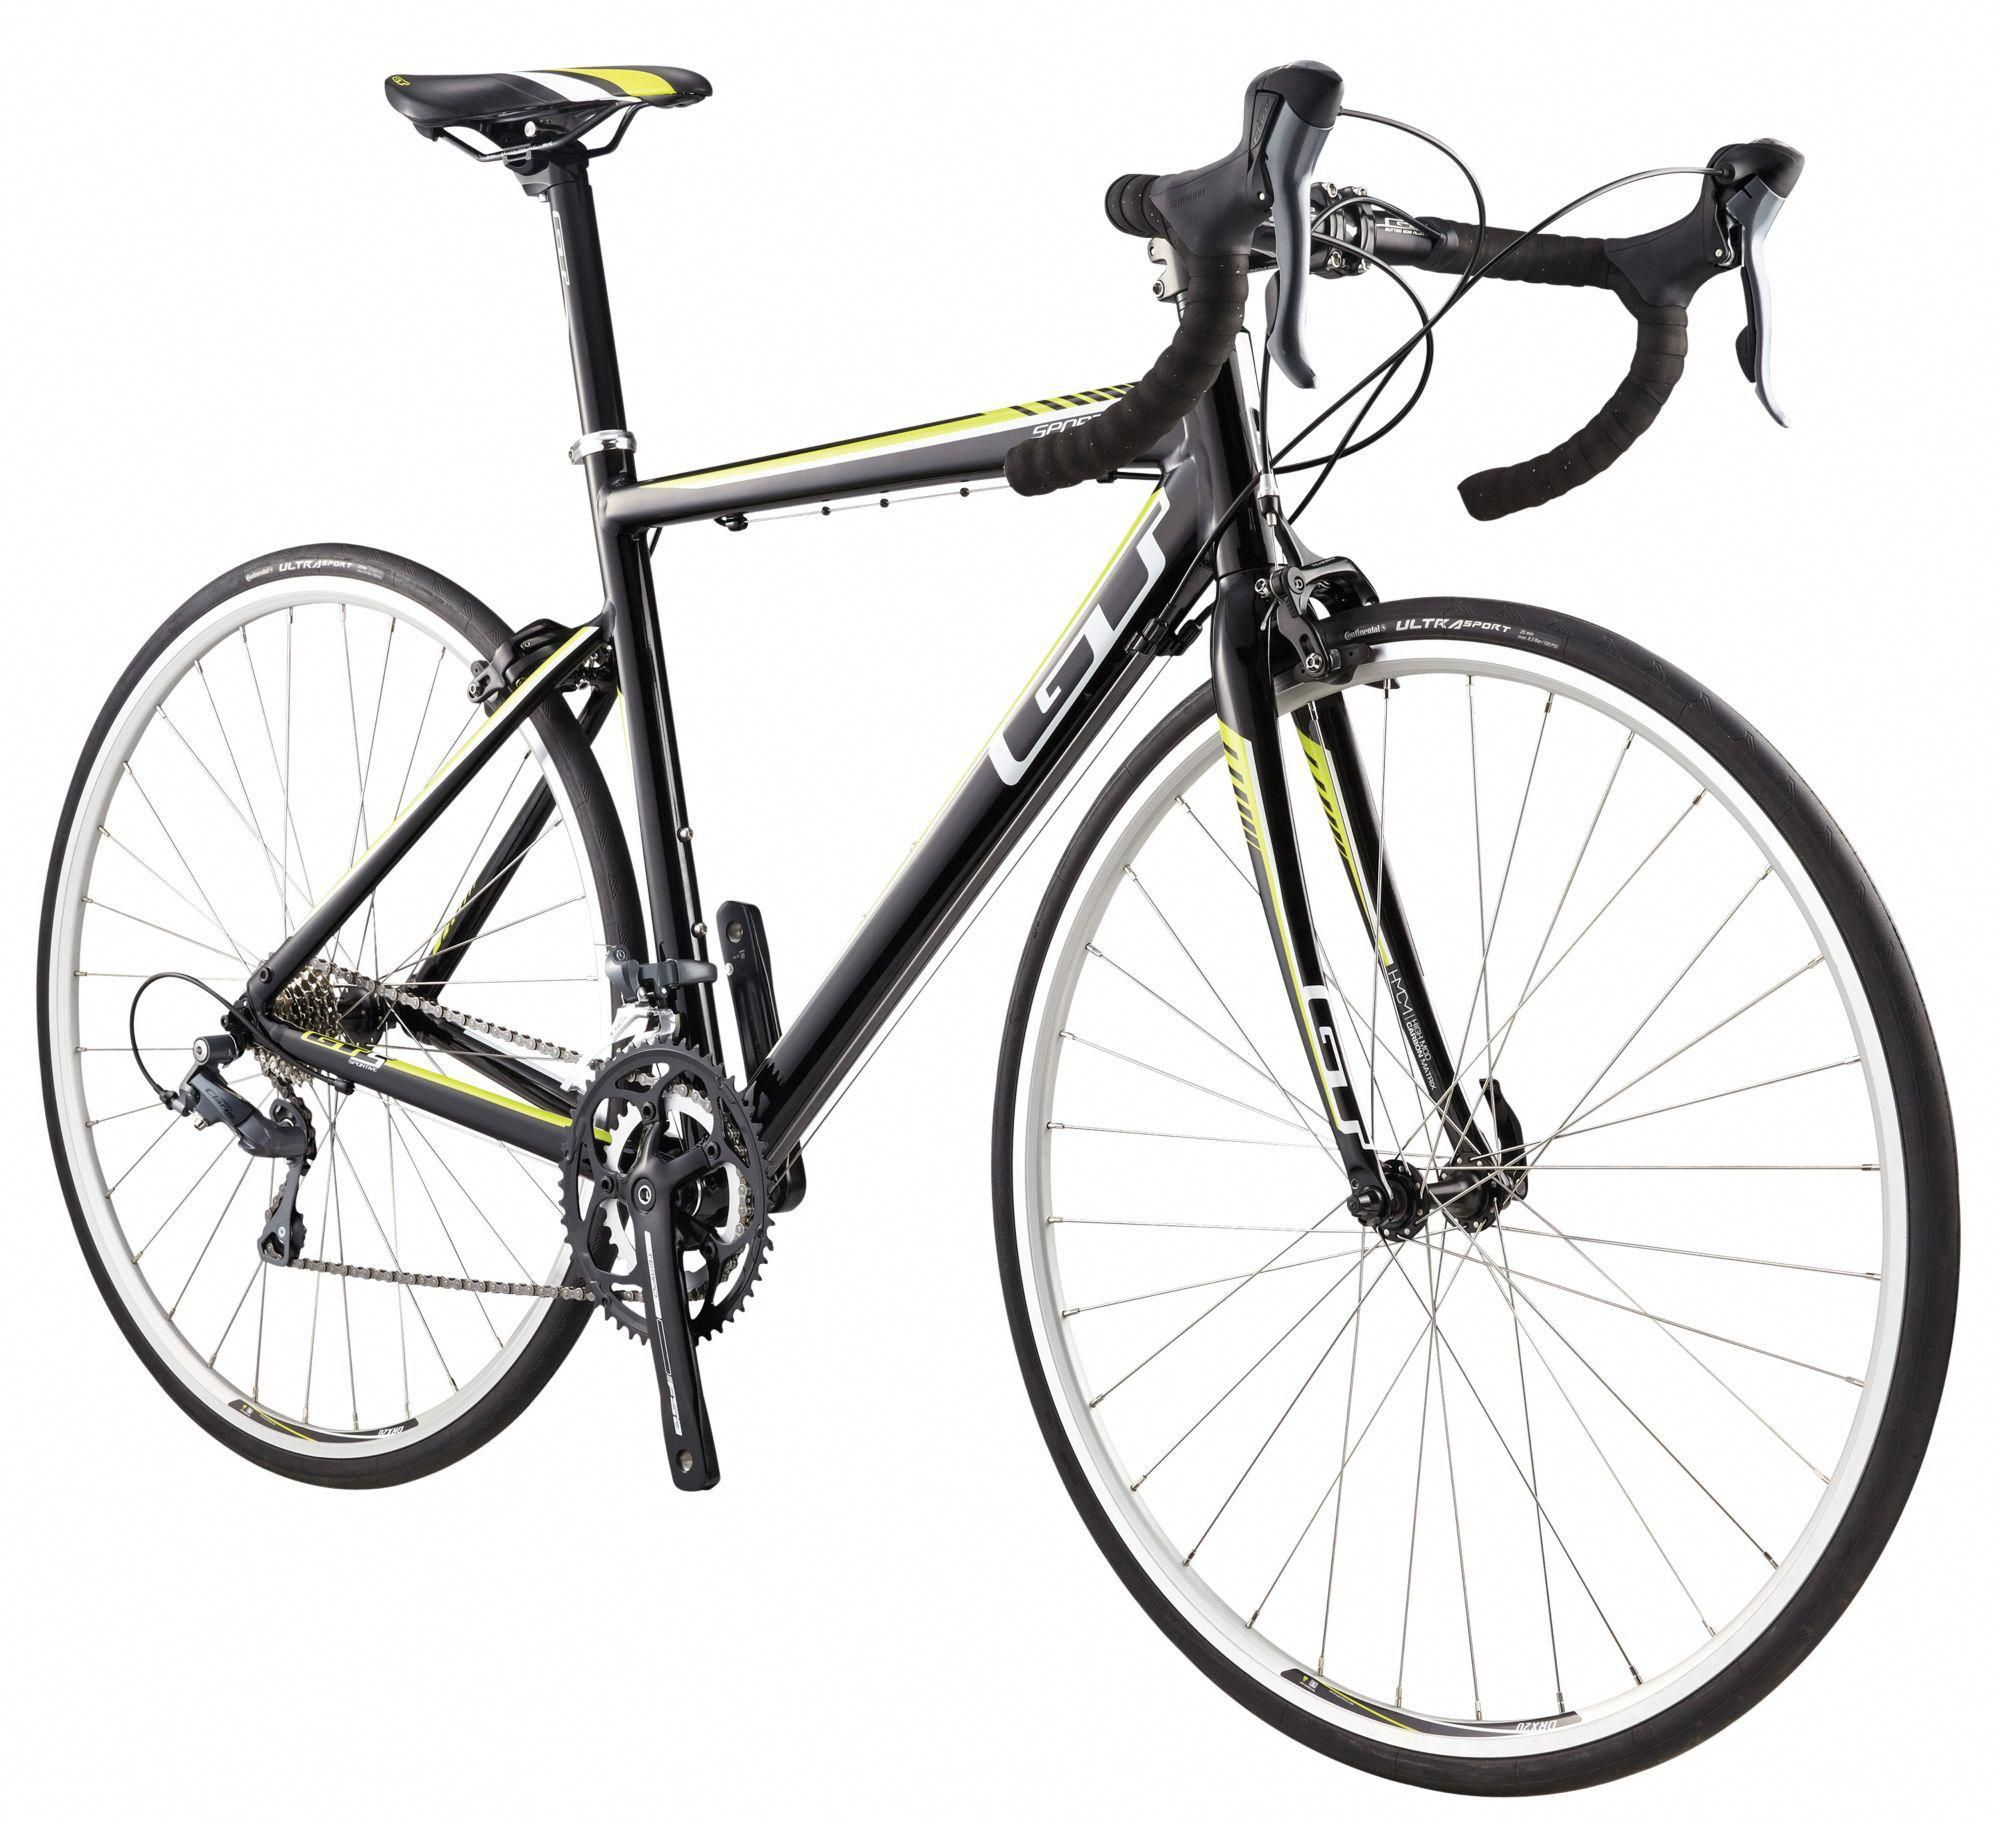 GT Men's GTS Sport Road Bike Bicycle, Mountain bike